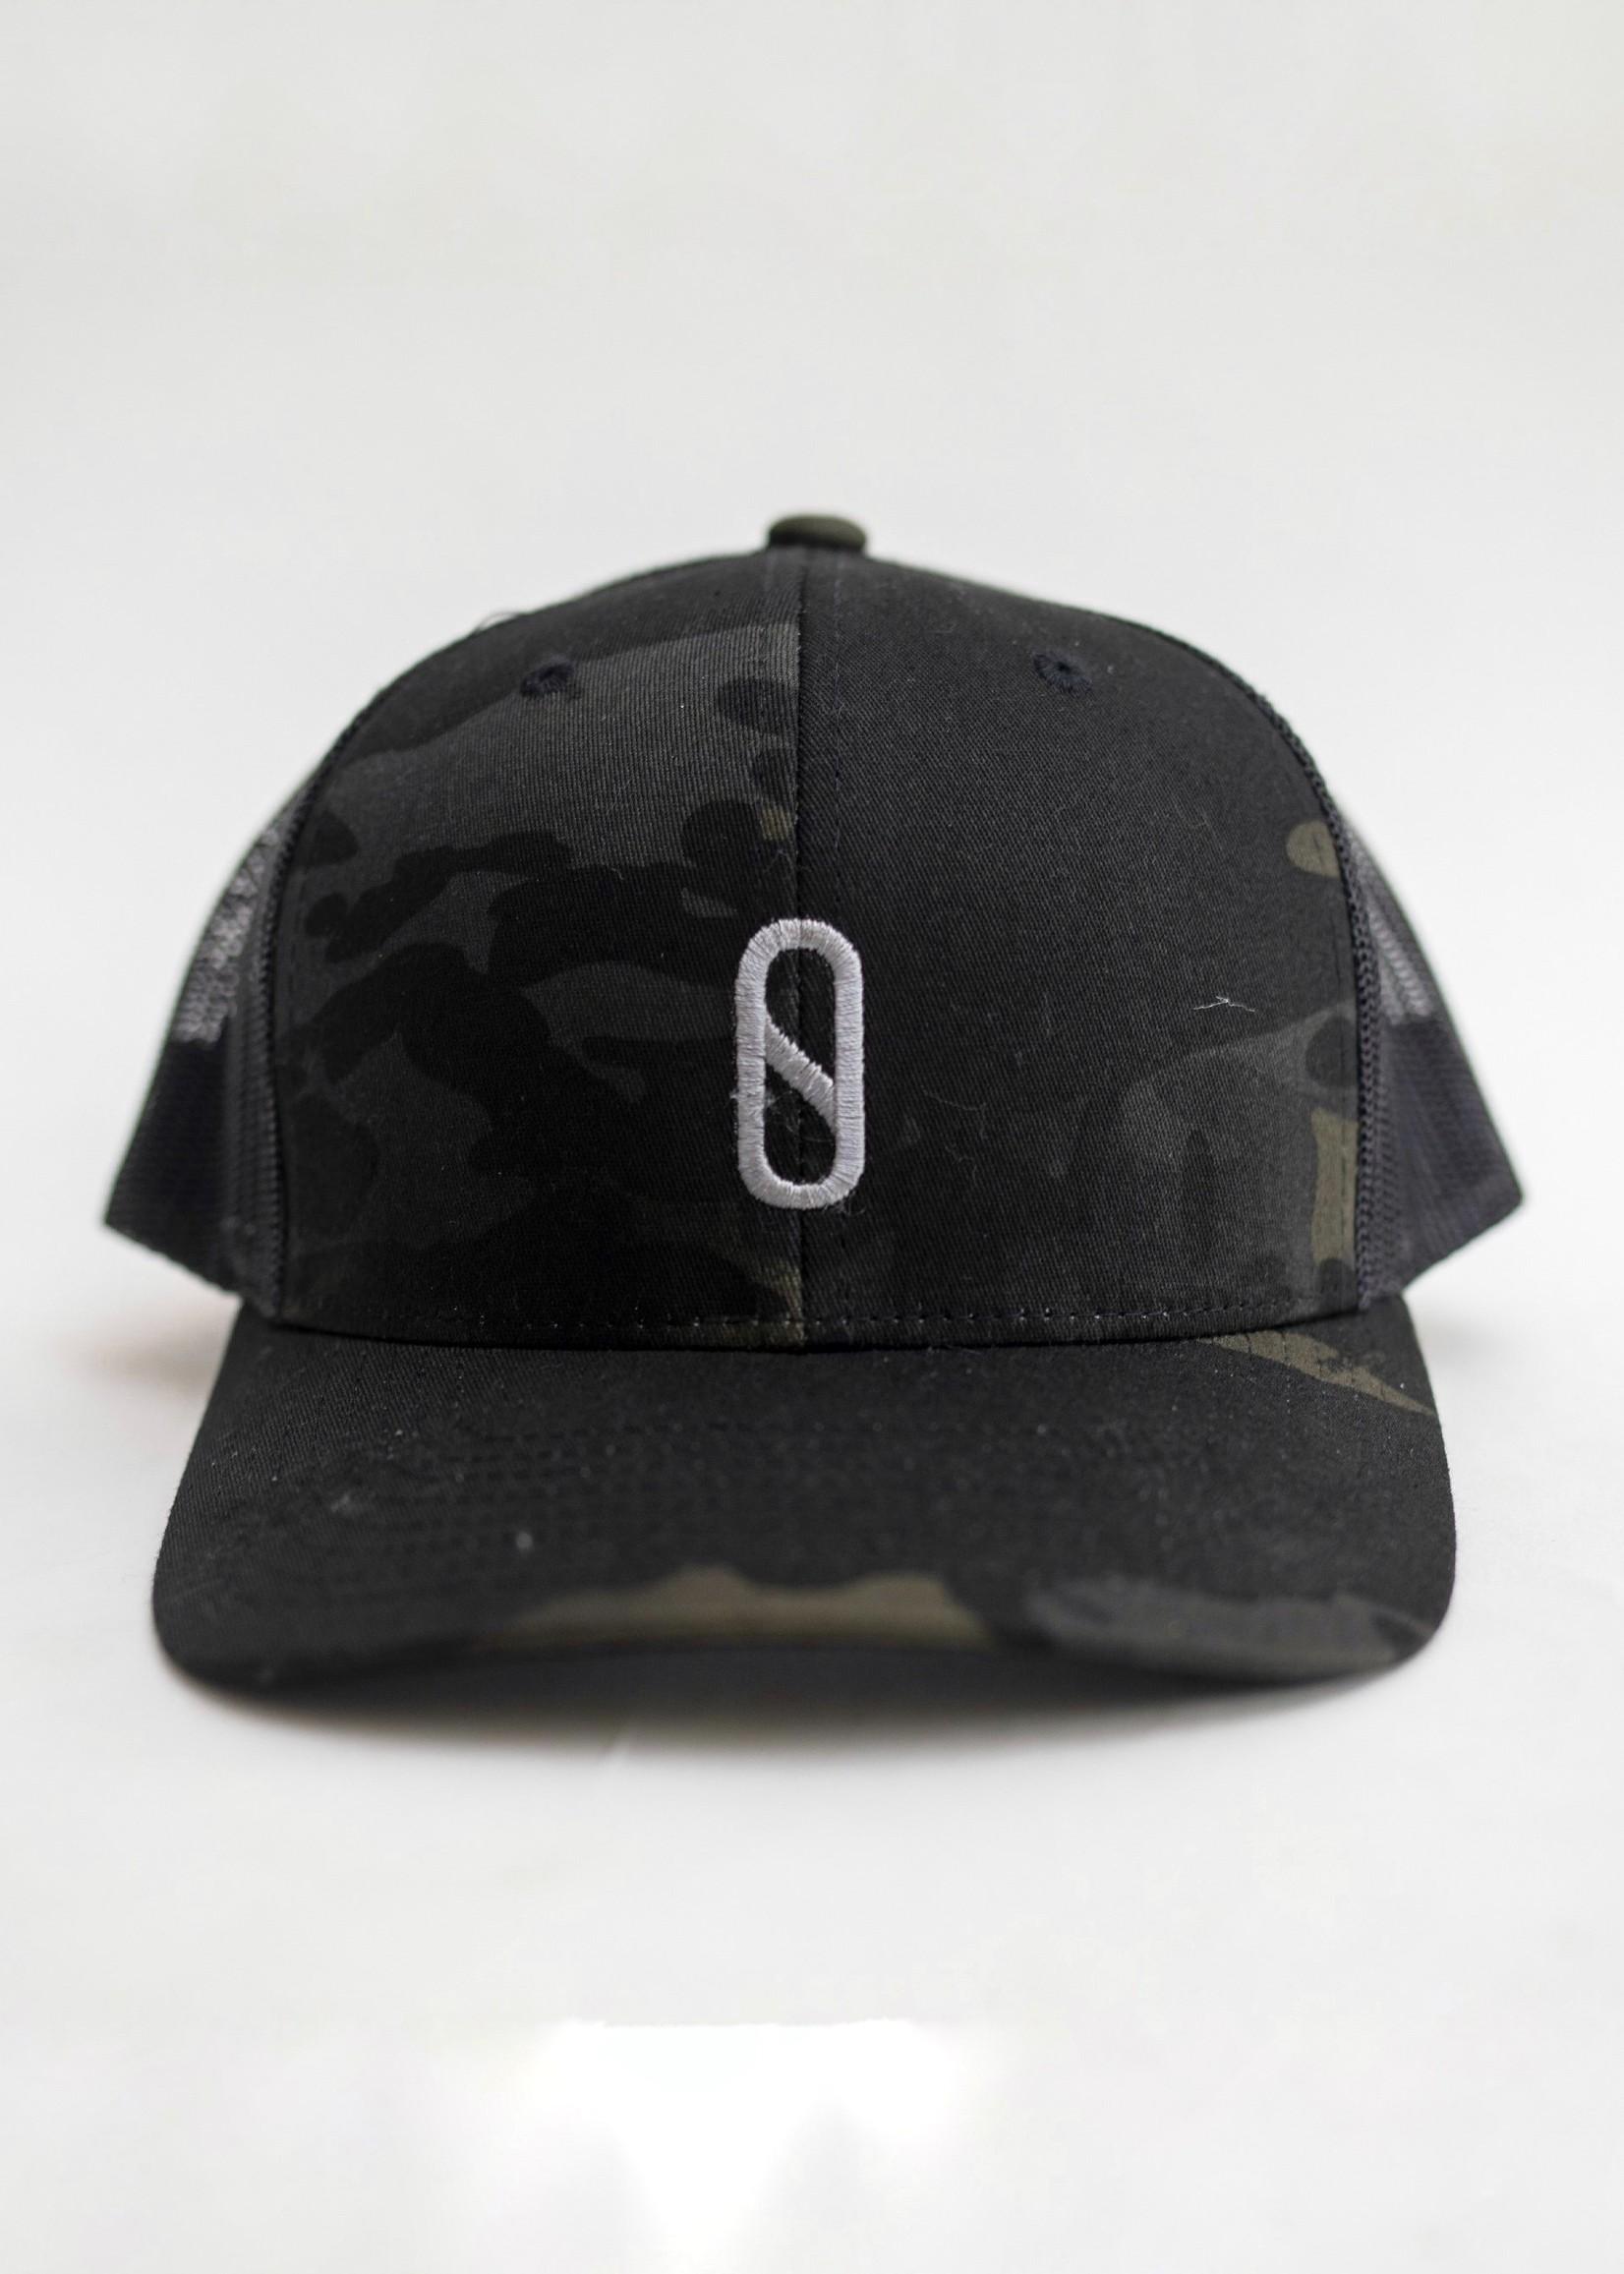 FIREWIRE Firewire Slater Designs Pill Trucker Hat